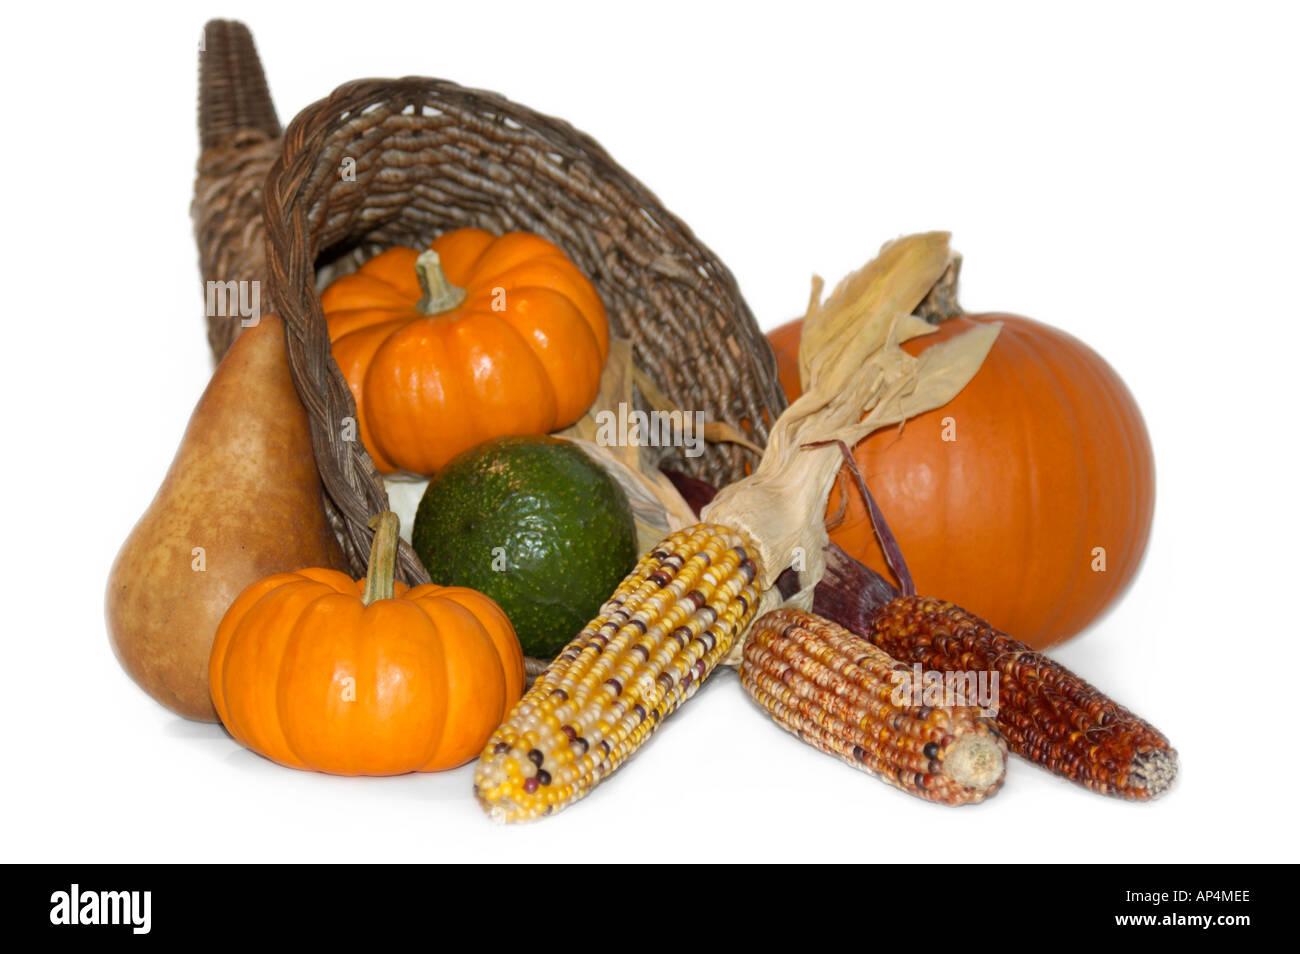 Thanksgiving harvest scene with cornucopia isolated against white background - Stock Image